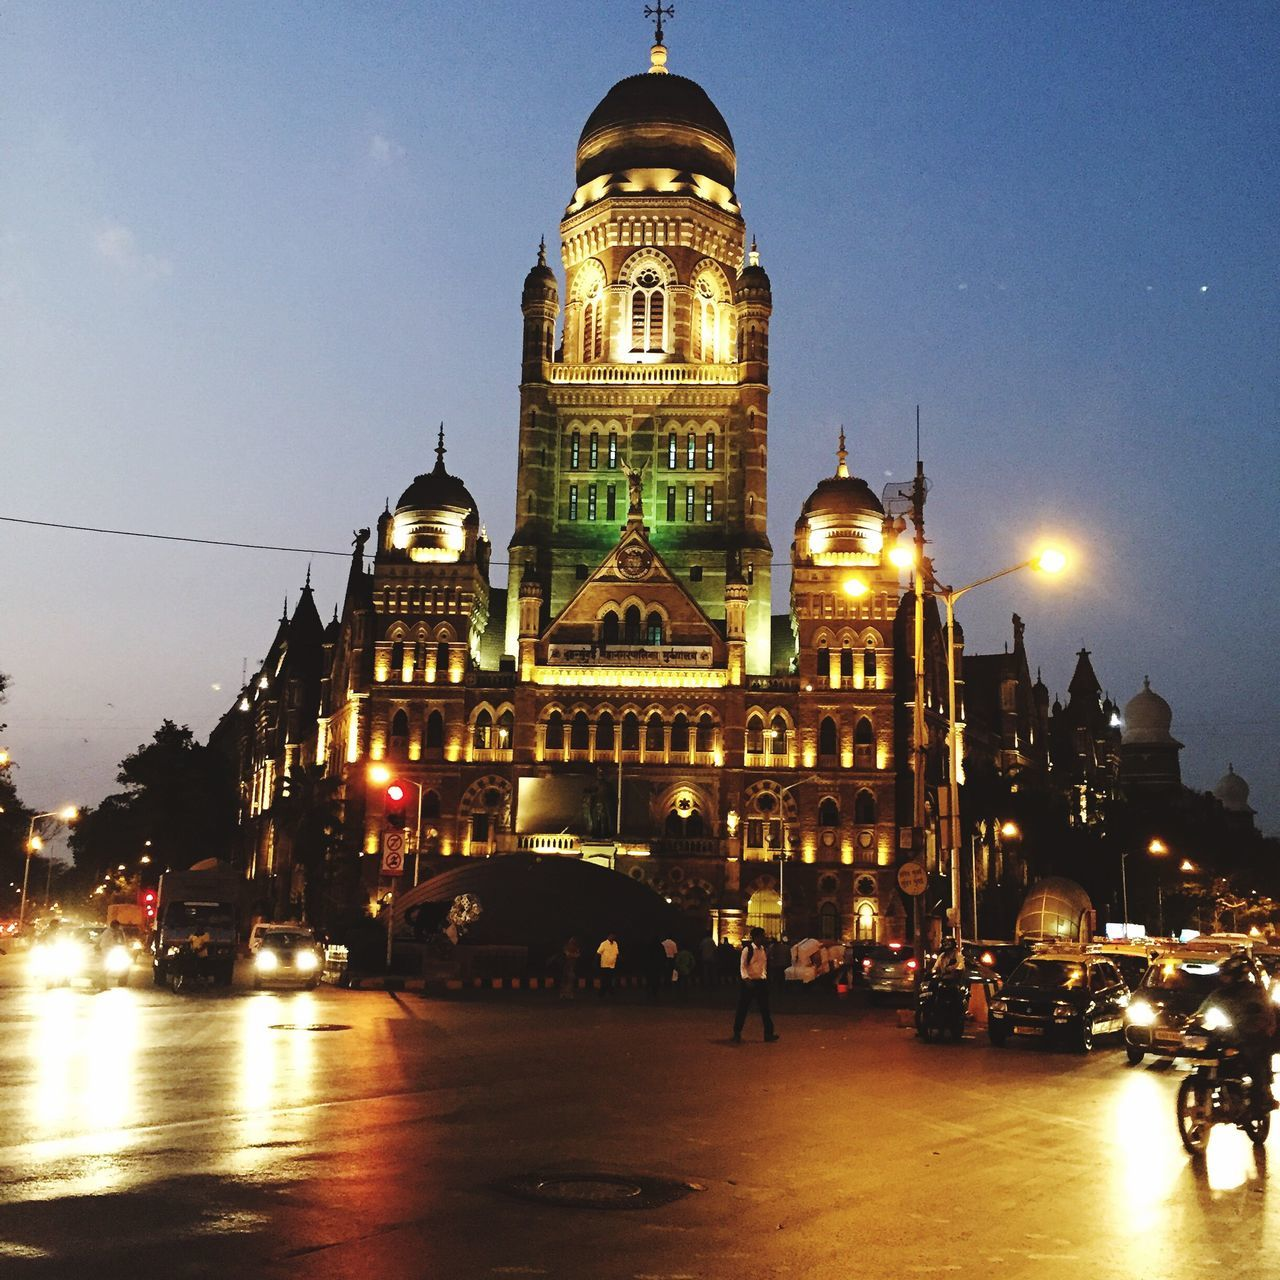 Illuminated realIndia First Eyeem Photo